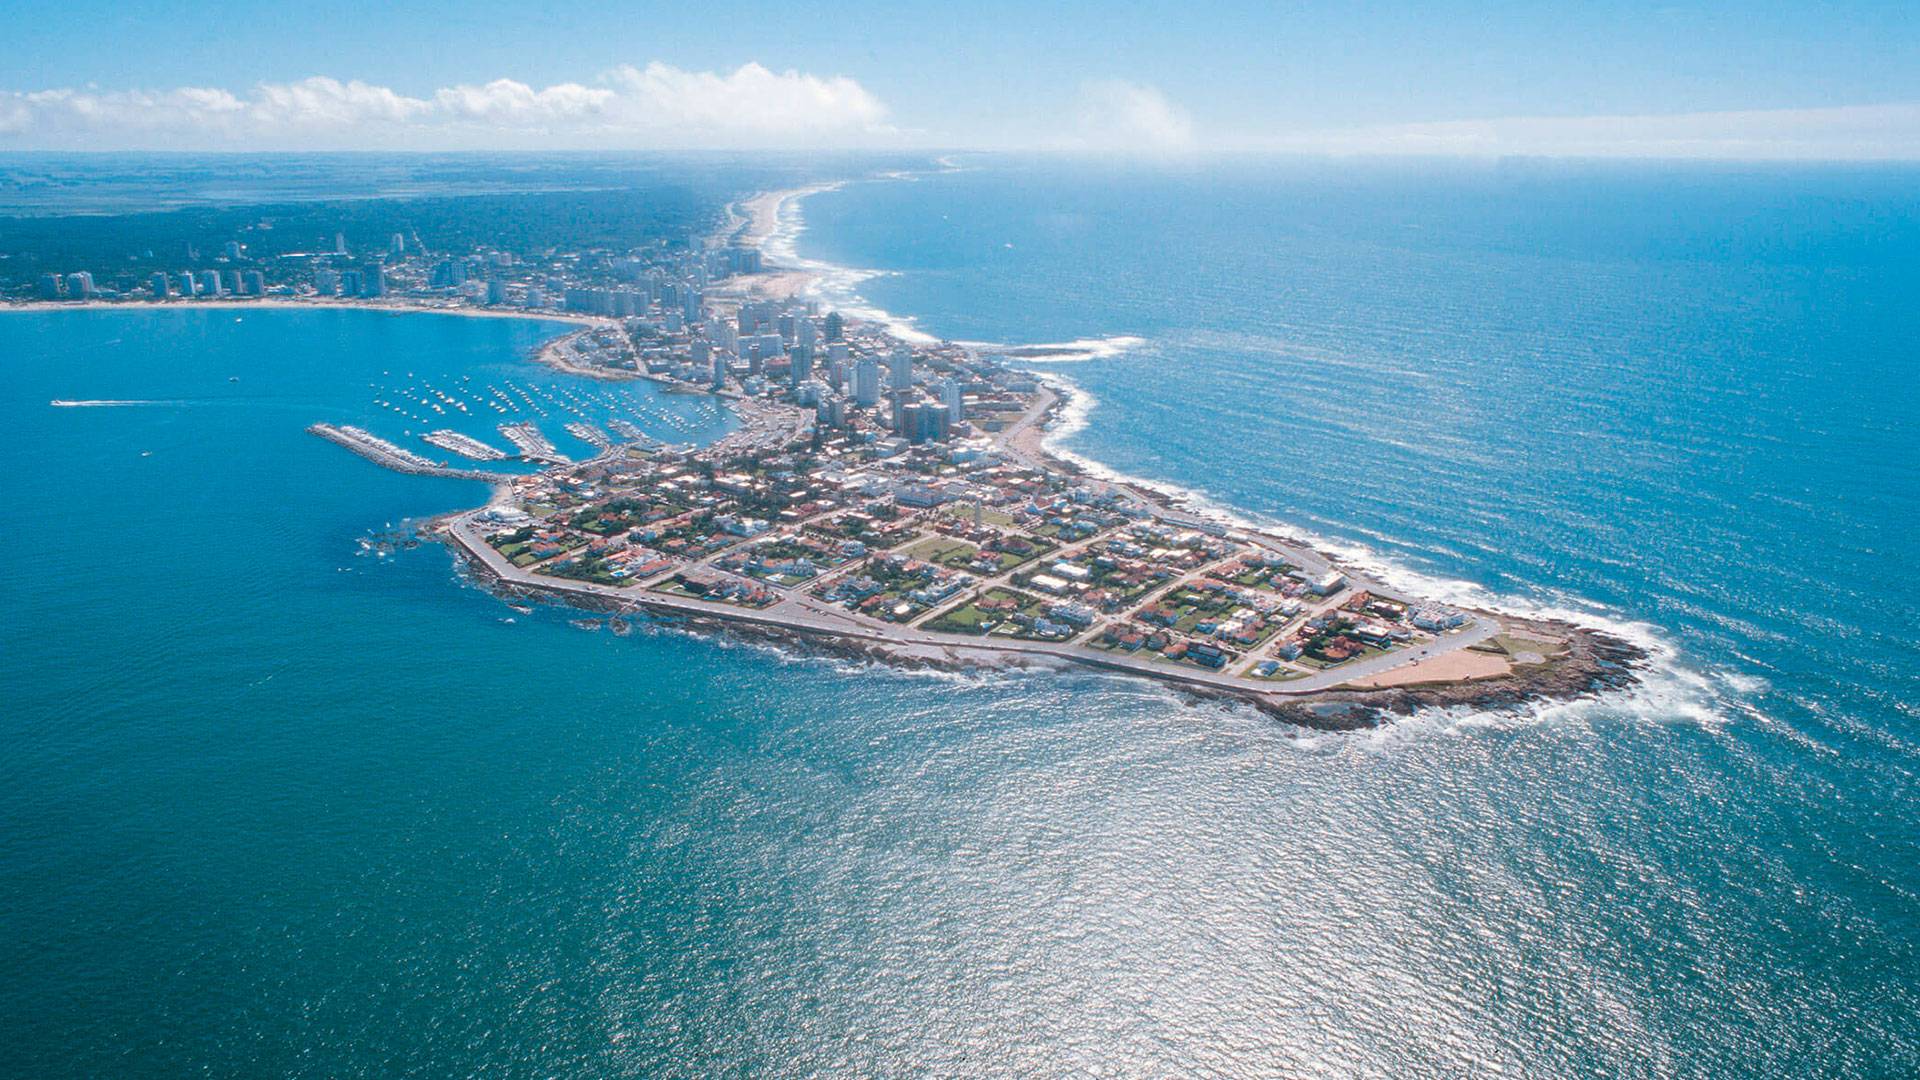 Lujo natural en Uruguay hero asset